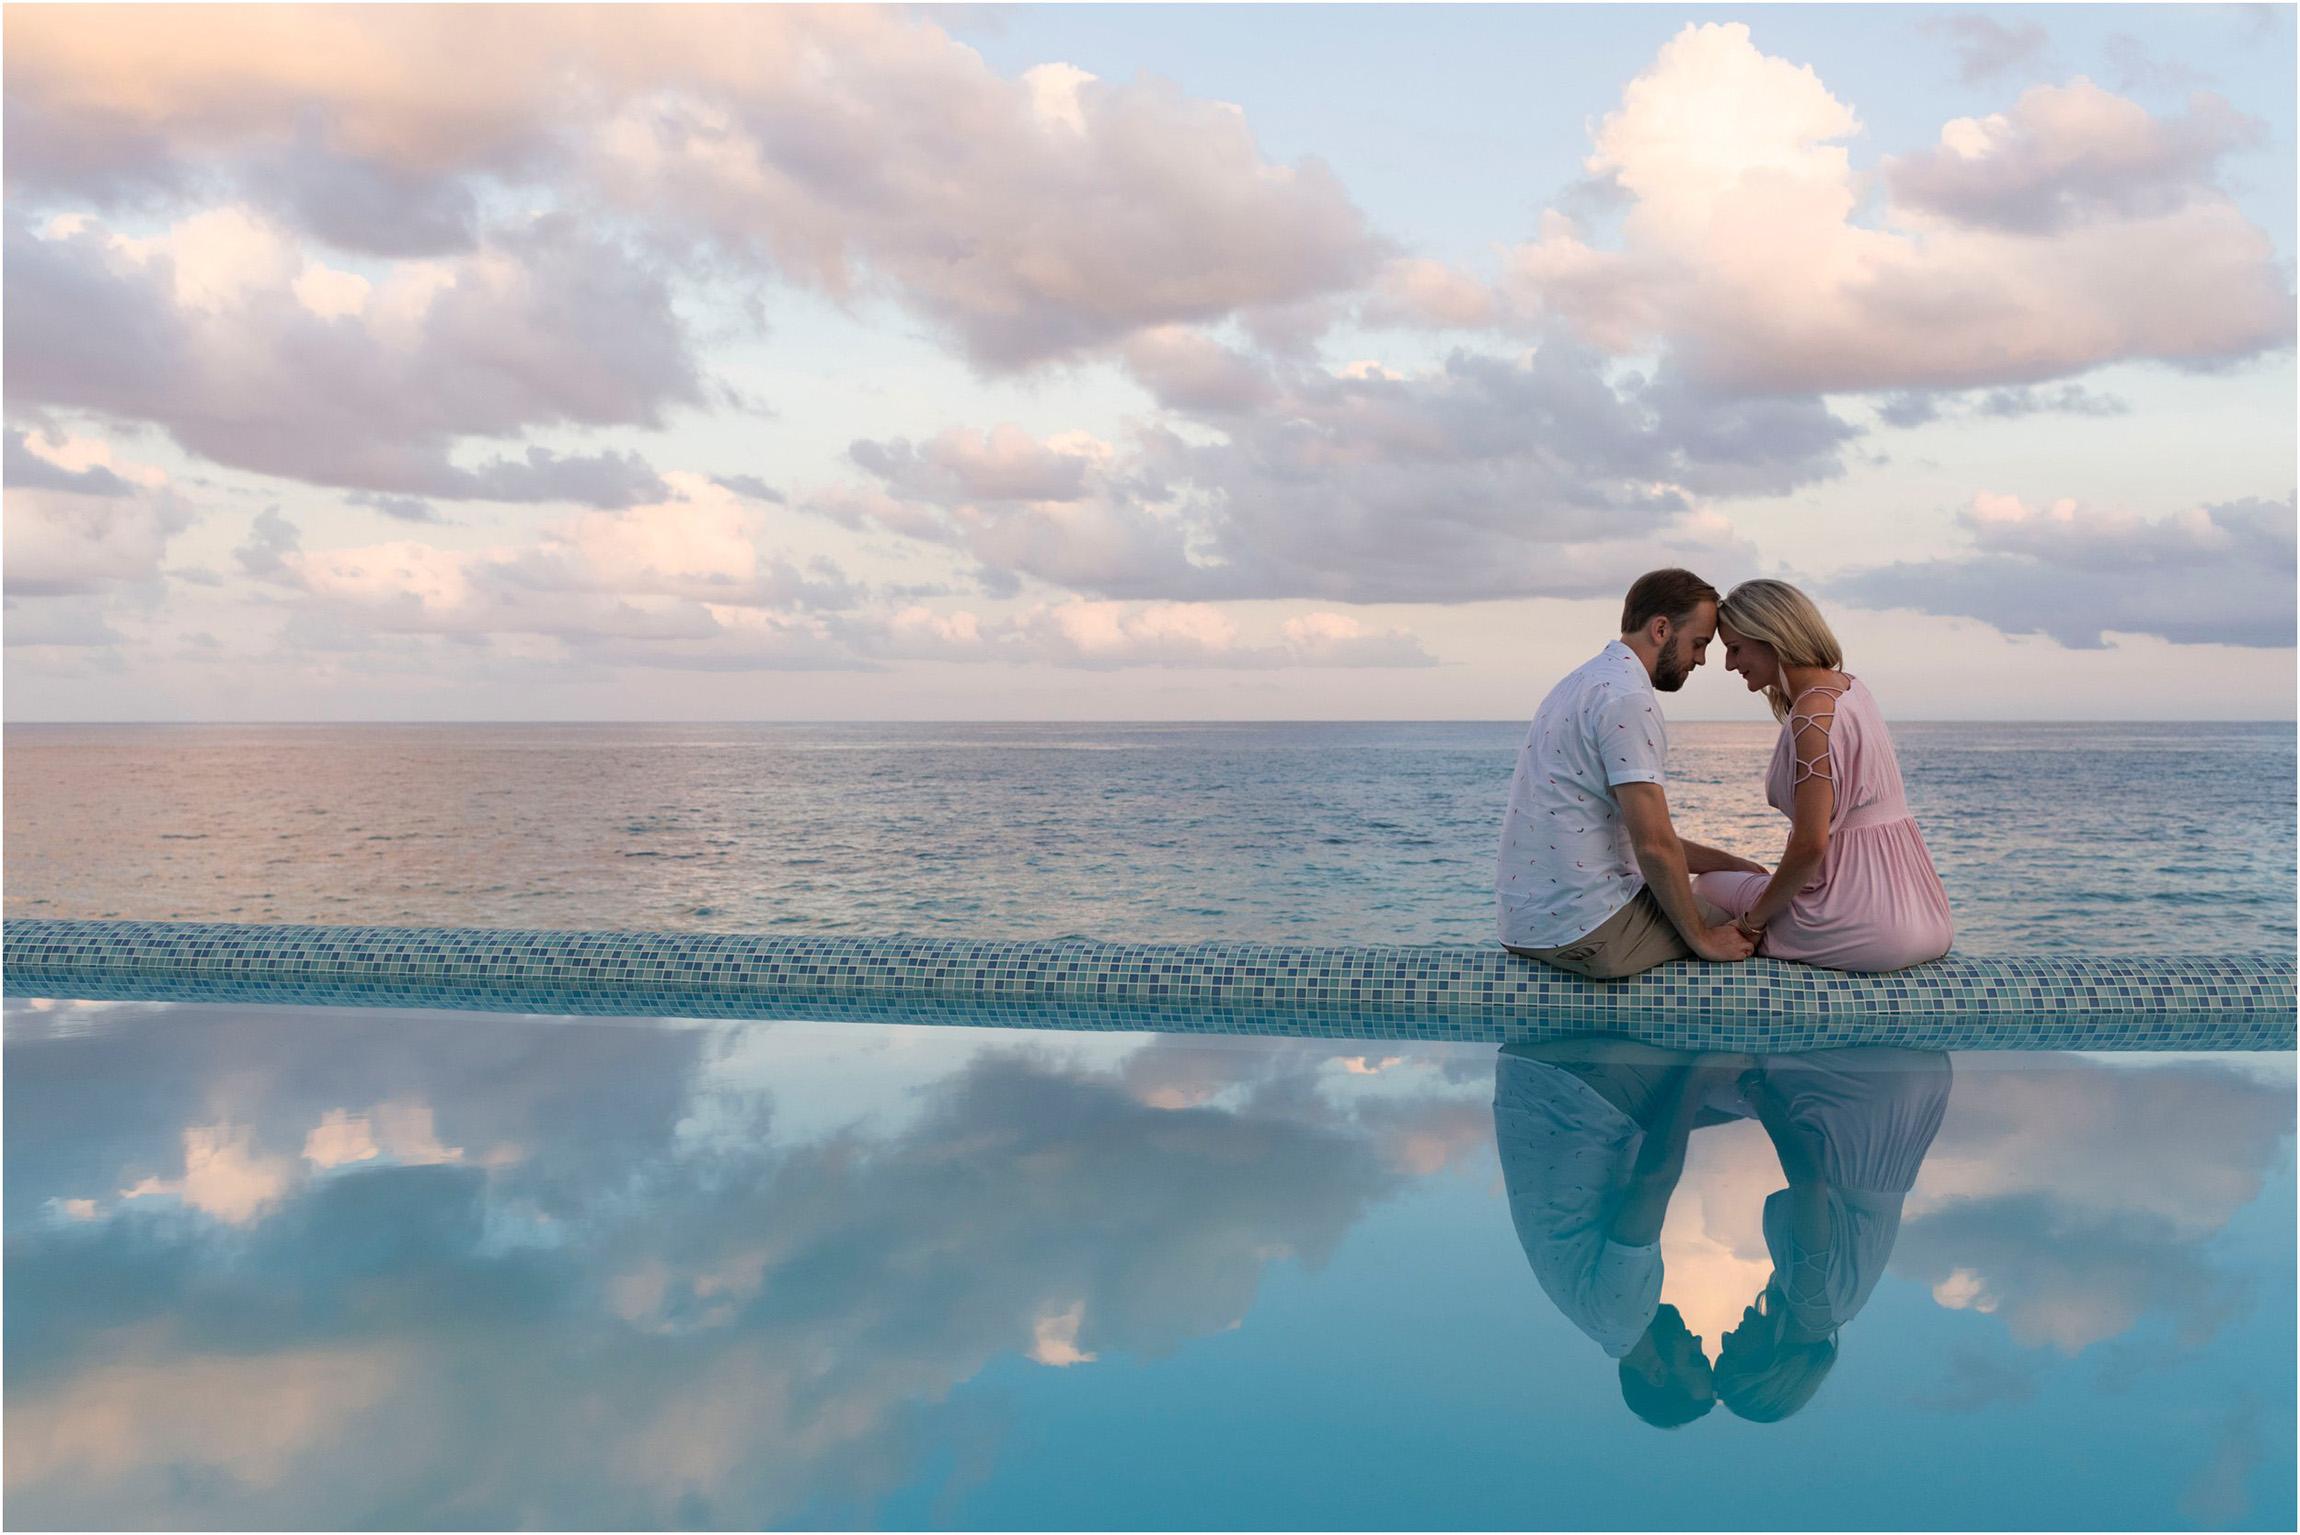 ©FianderFoto_Bermuda_Tom Moore's Jungle_Proposal Maternity Photographer_Erika_Andy_033.jpg